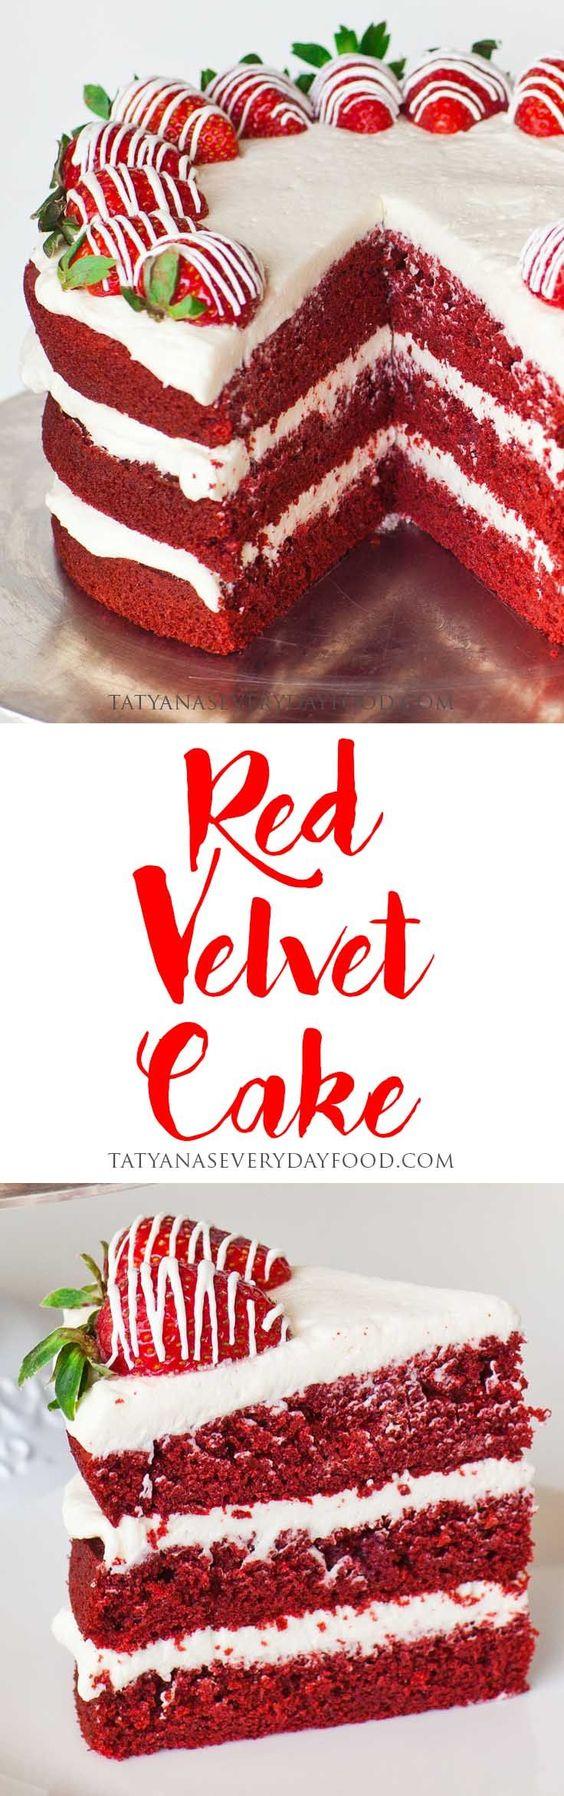 Tatyanas Everyday Food Red Velvet Cake